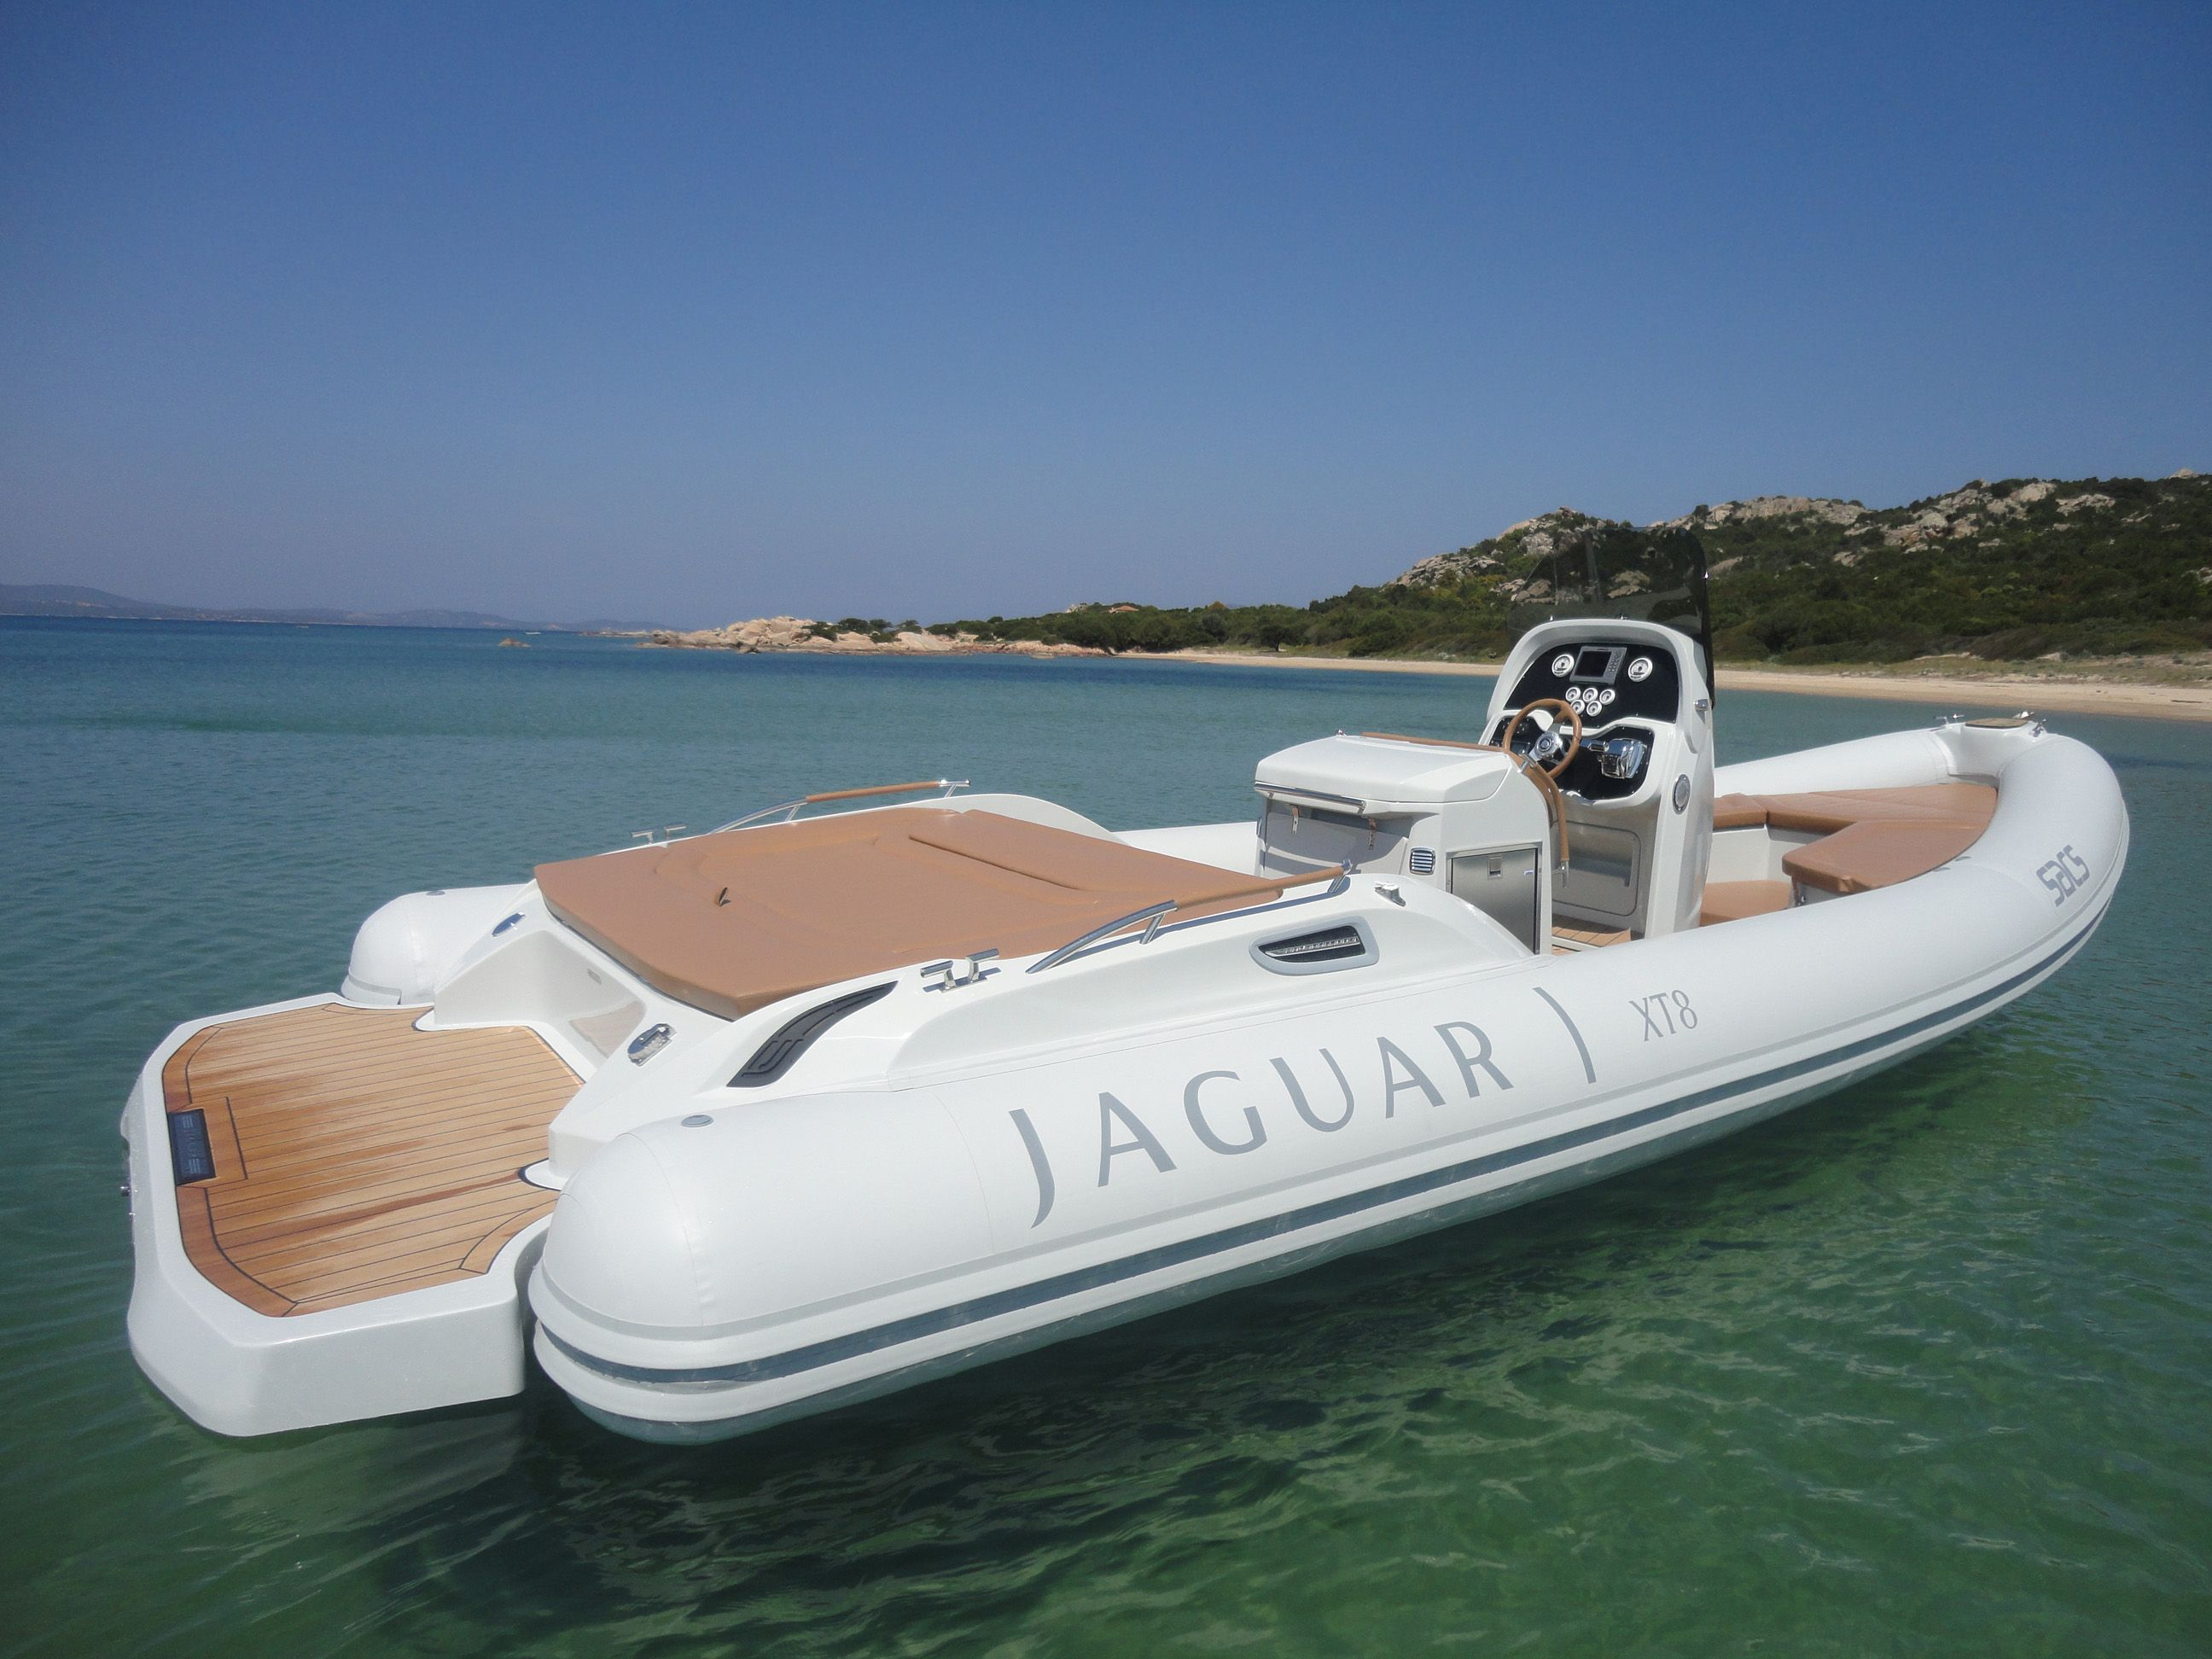 Gommone Rib Jaguar Xt8 Lusso E Sportivit 224 Per Navigare